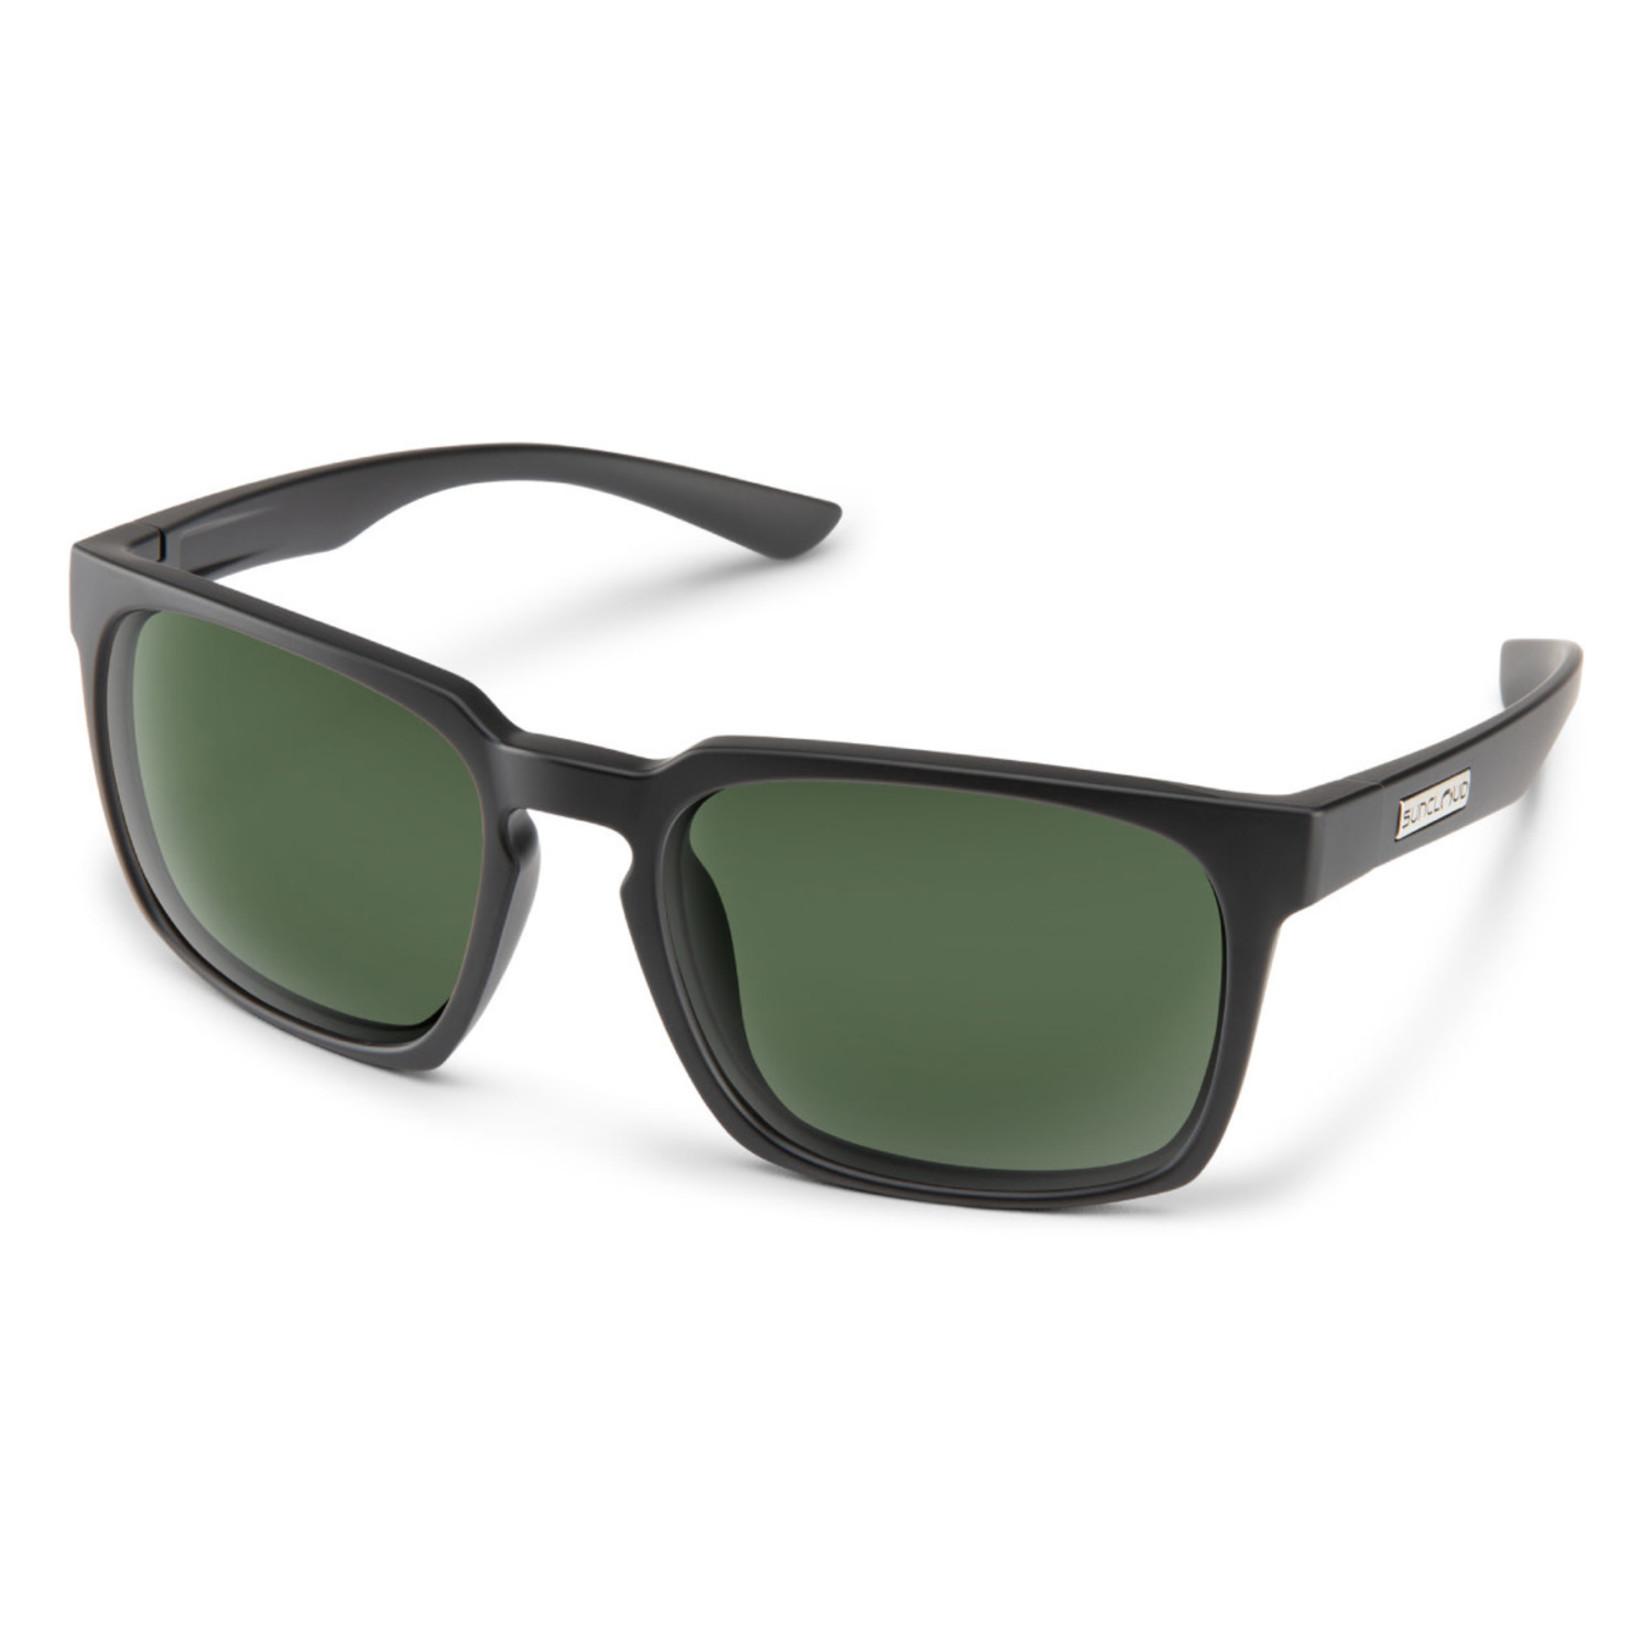 Suncloud Suncloud Hundo, Matte Black/ Polarized Green